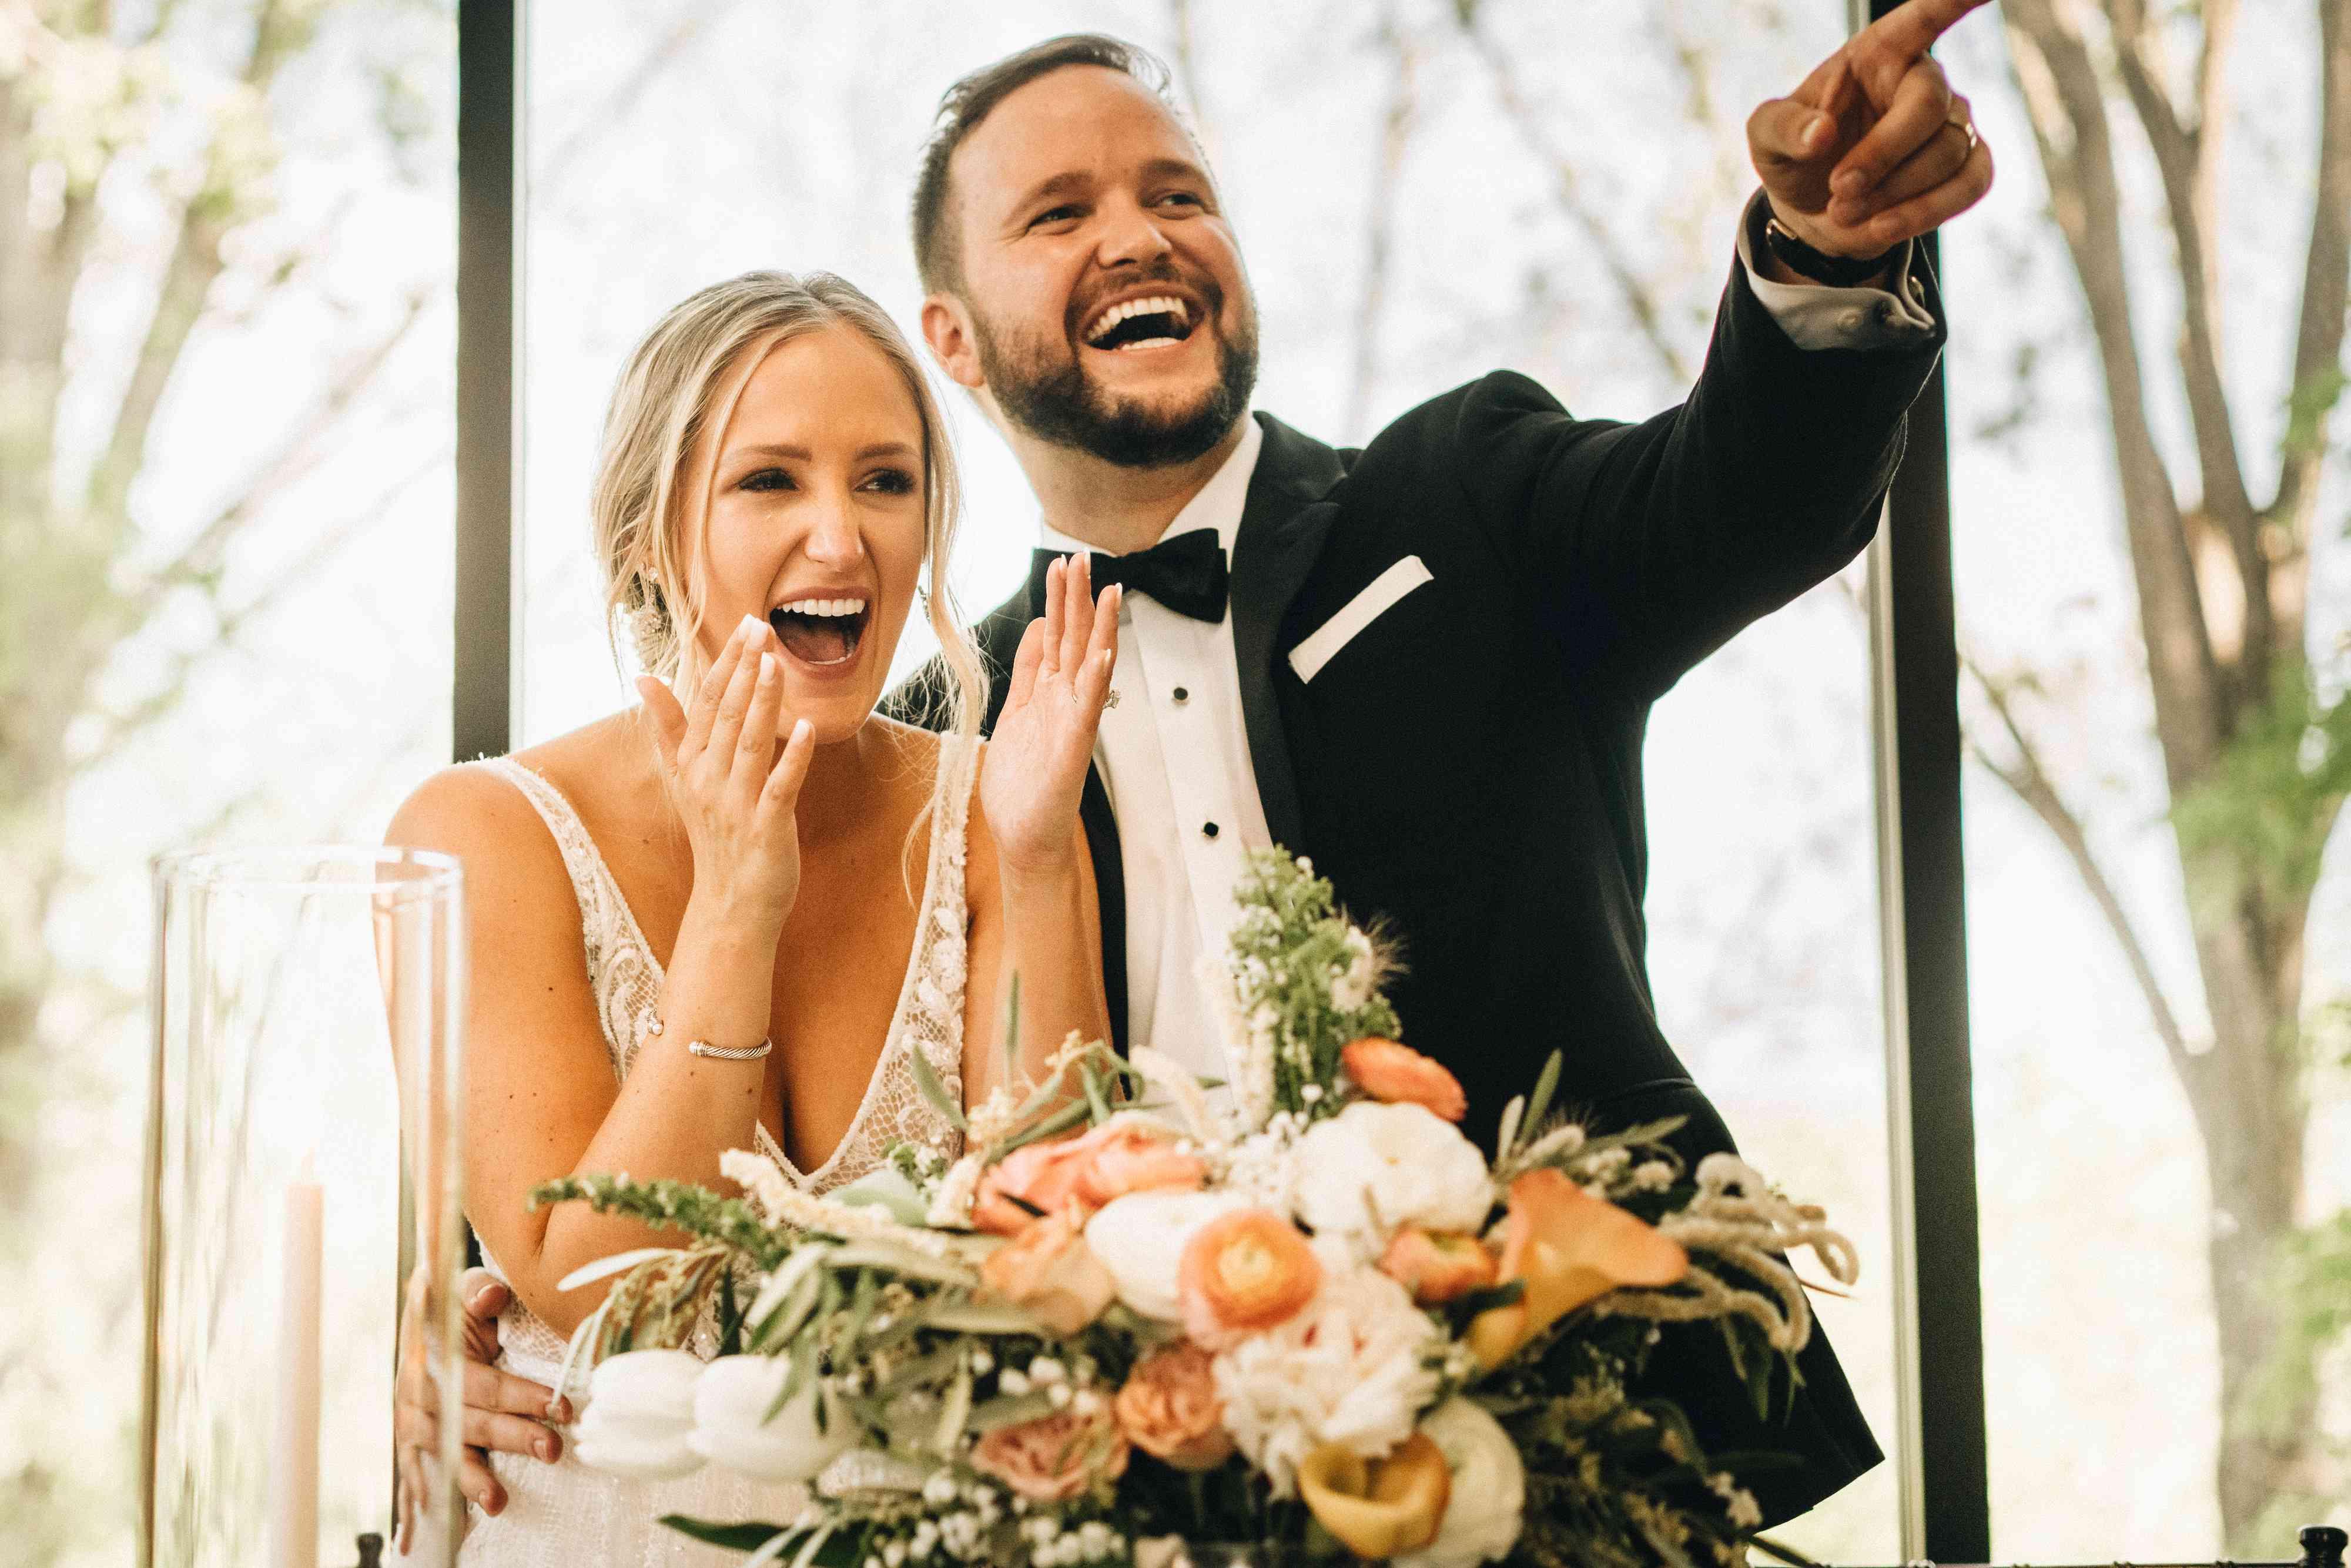 newlyweds laughing